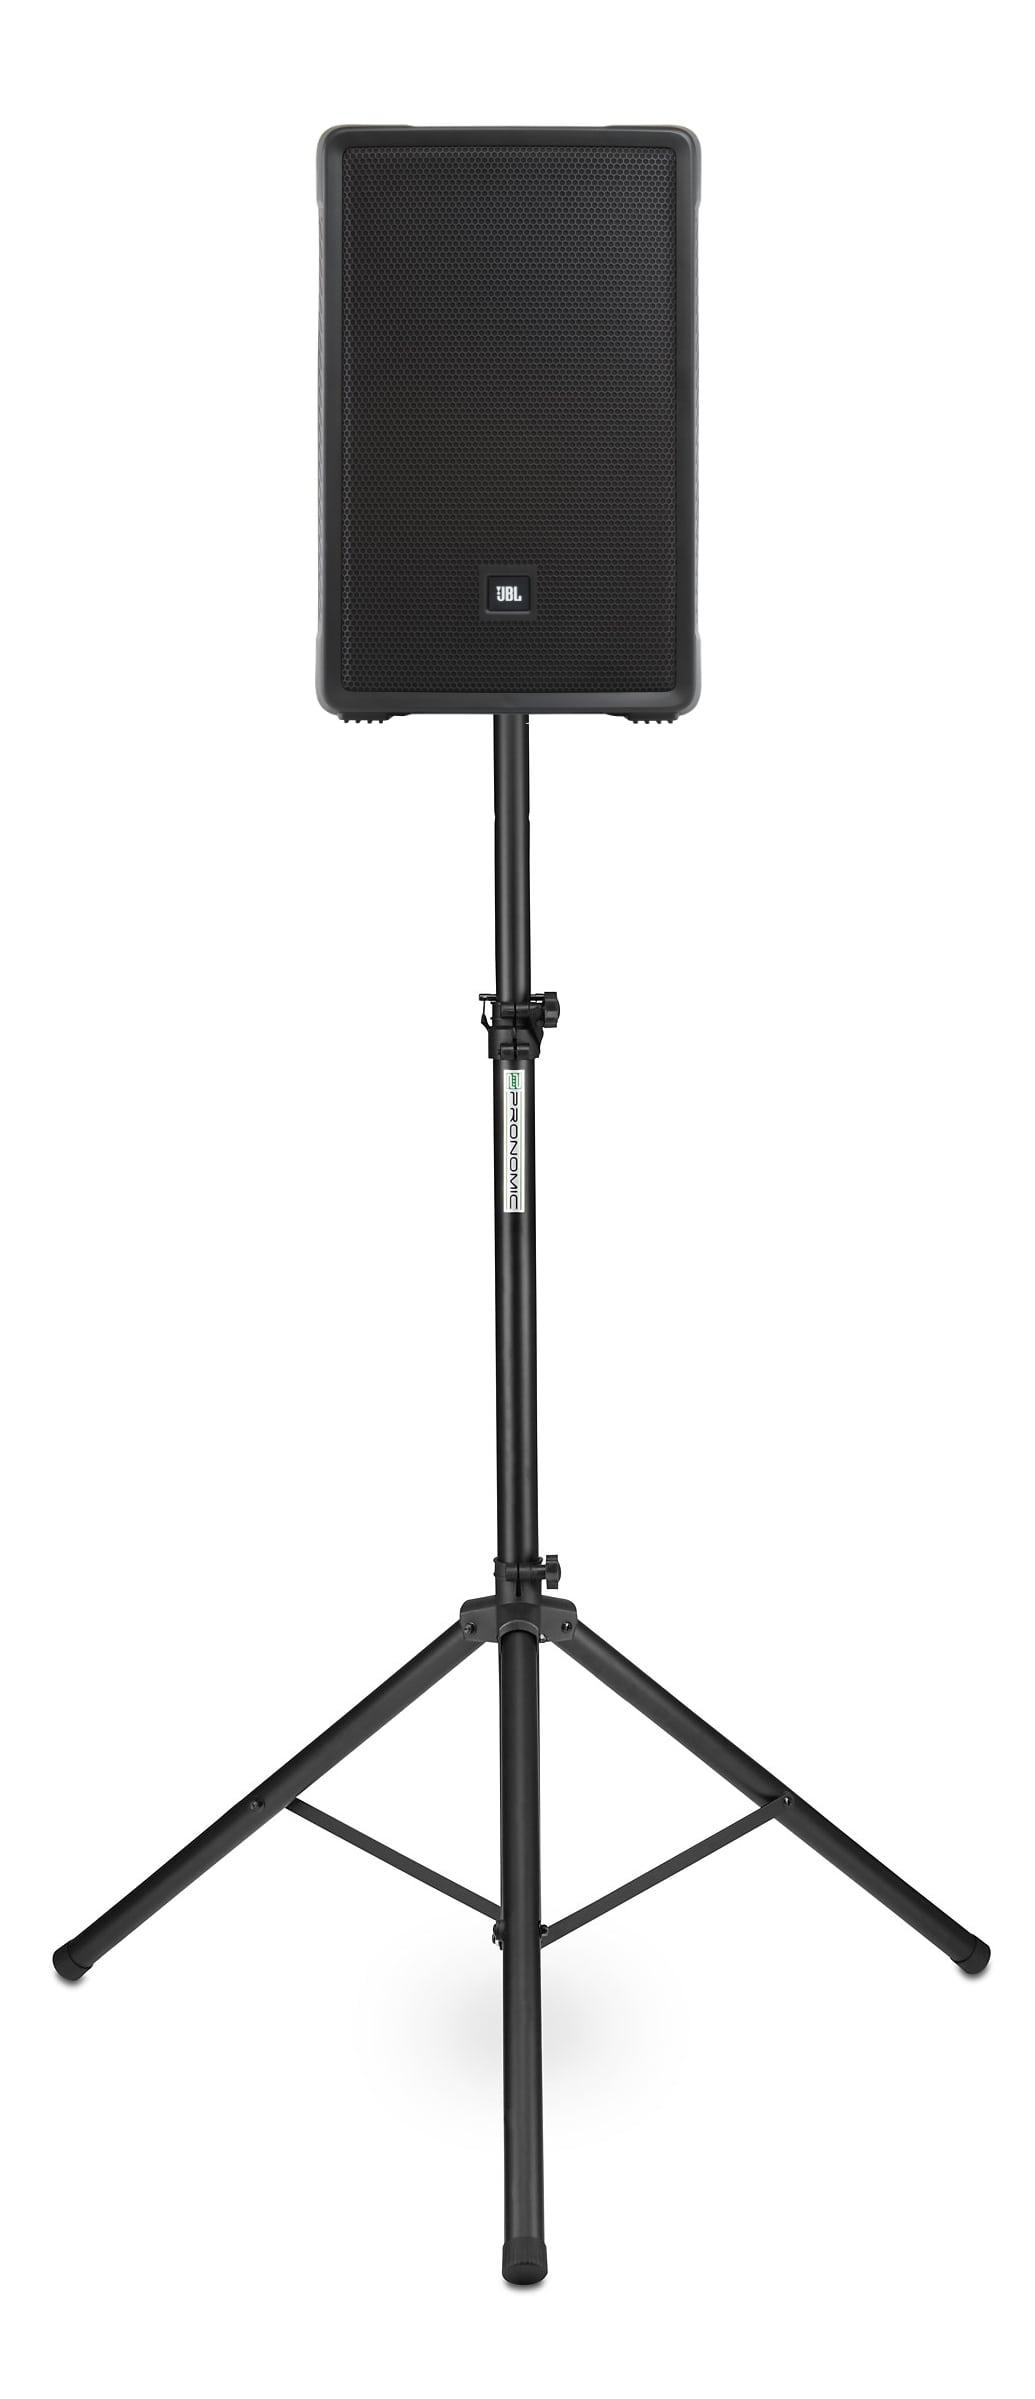 Paboxen - JBL IRX 112 BT Aktivbox Set inkl. Stativ - Onlineshop Musikhaus Kirstein